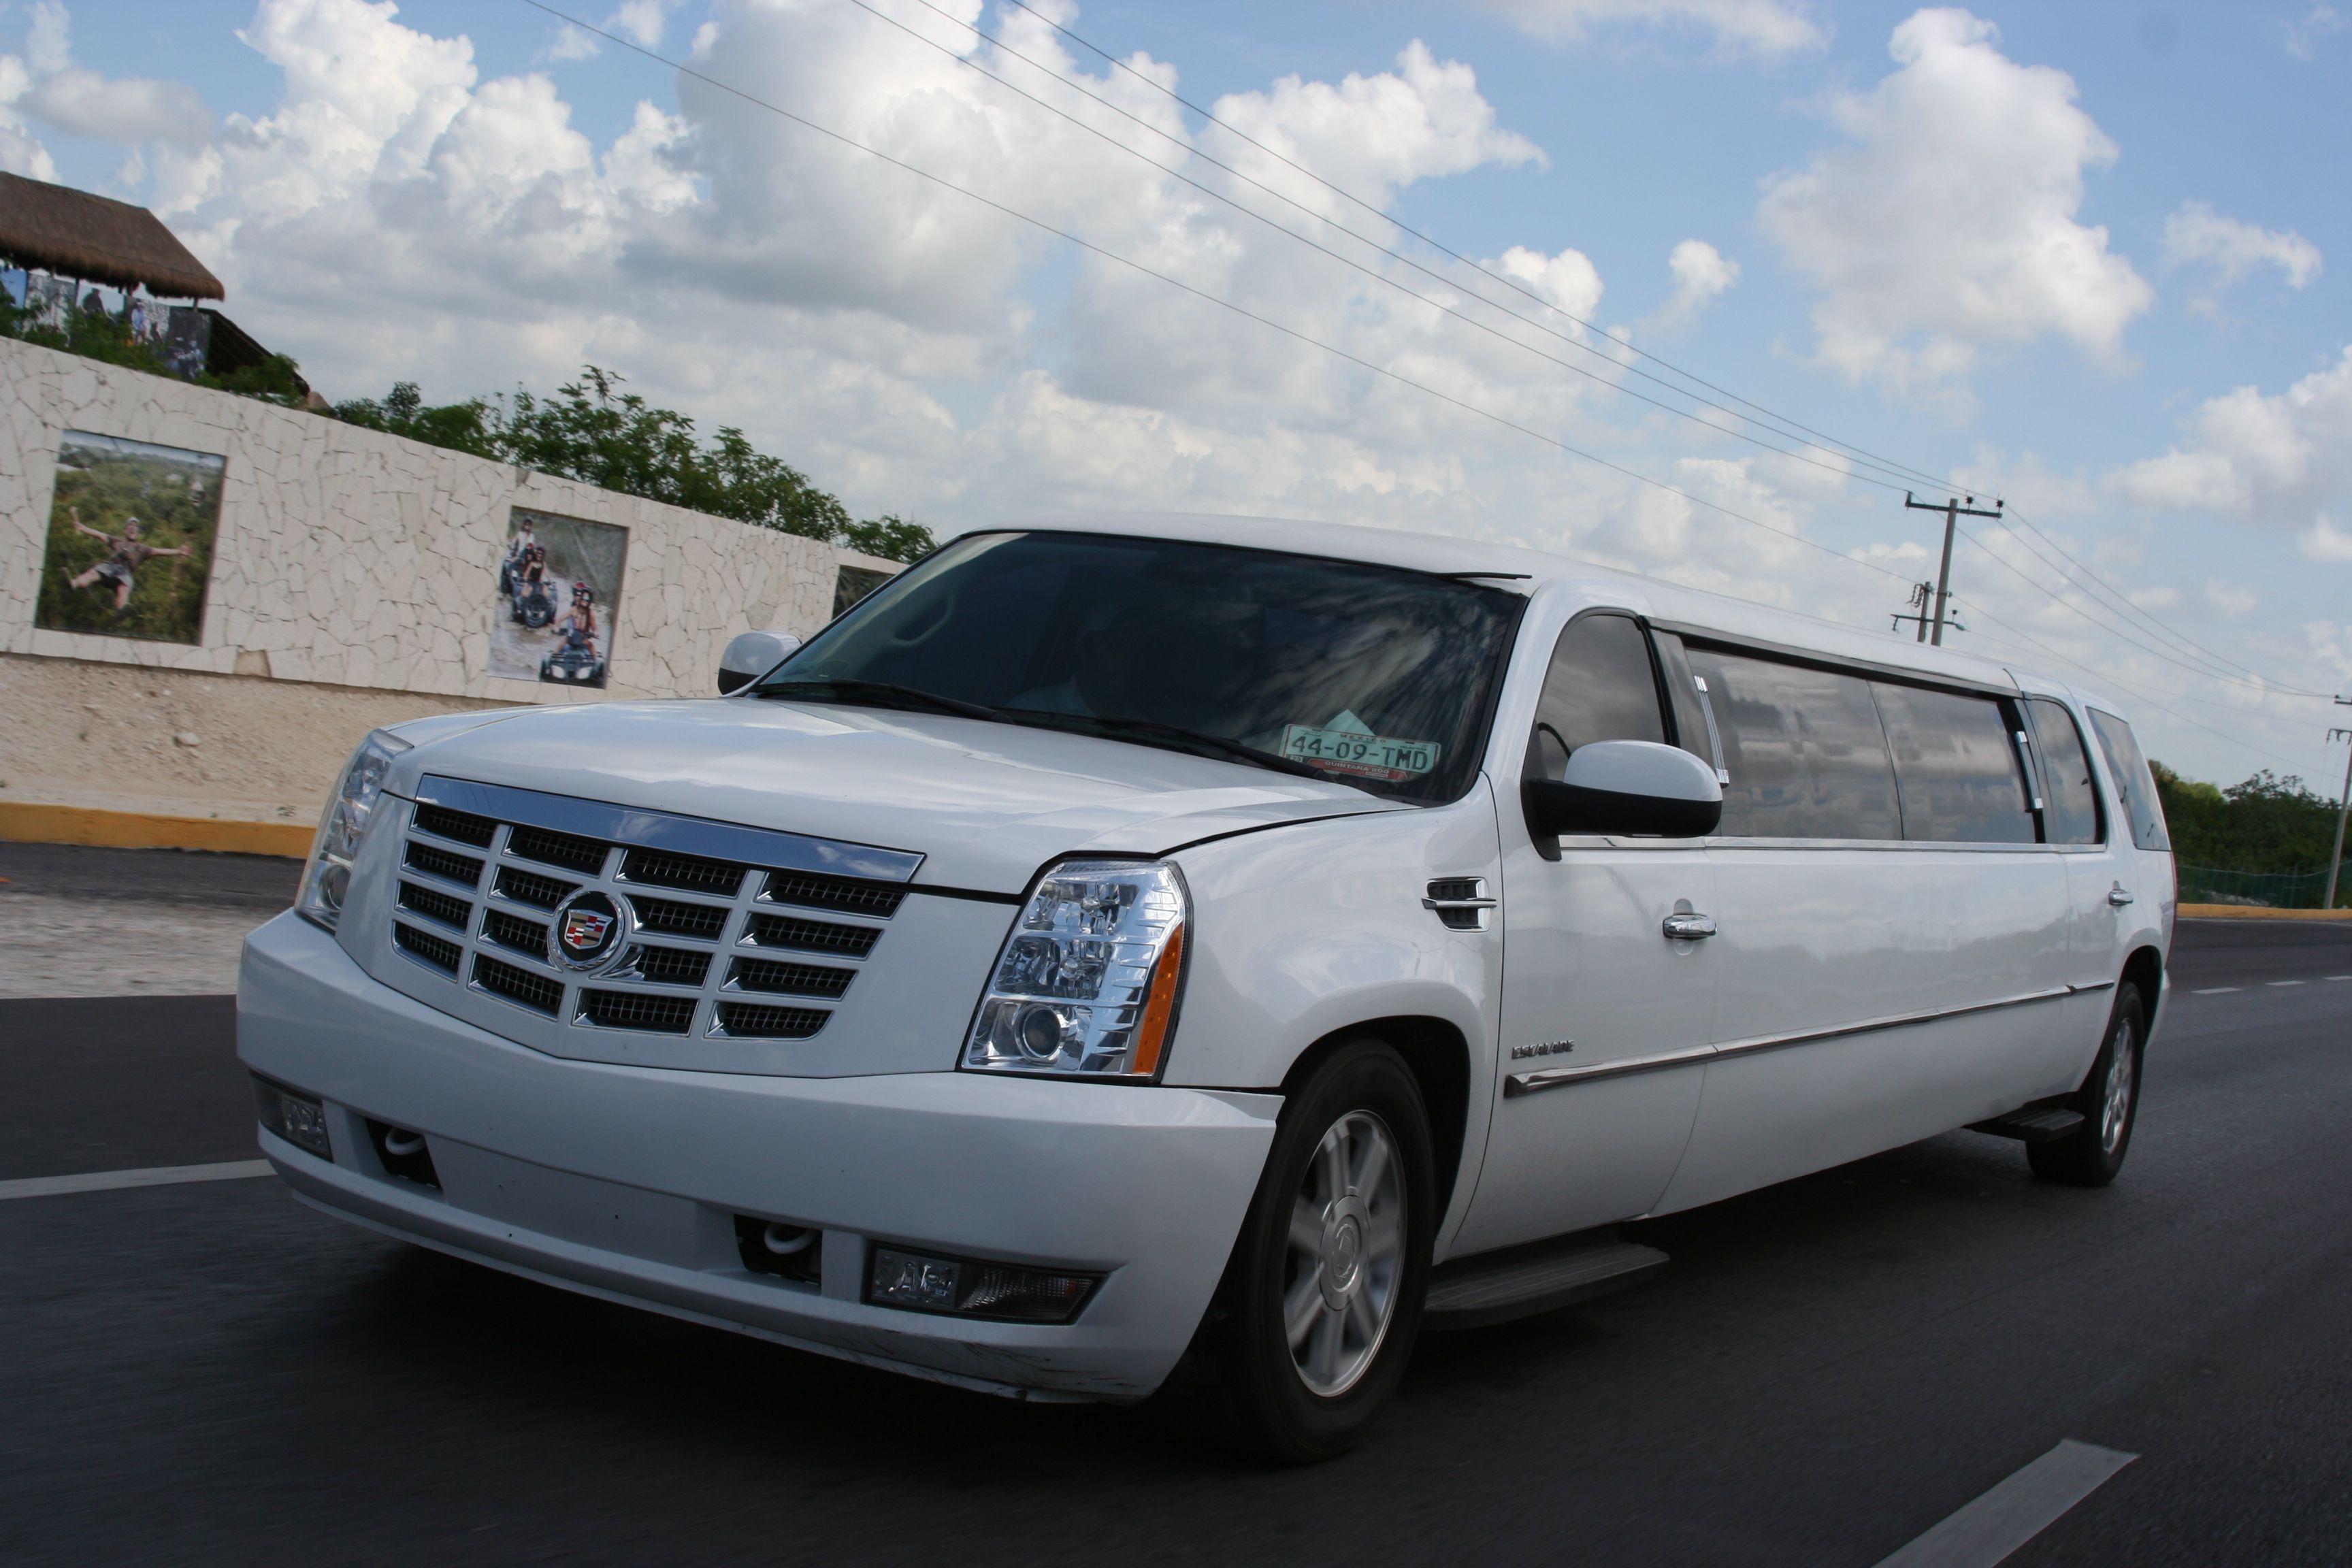 Arizona limousine services | Car rental service, Car ...